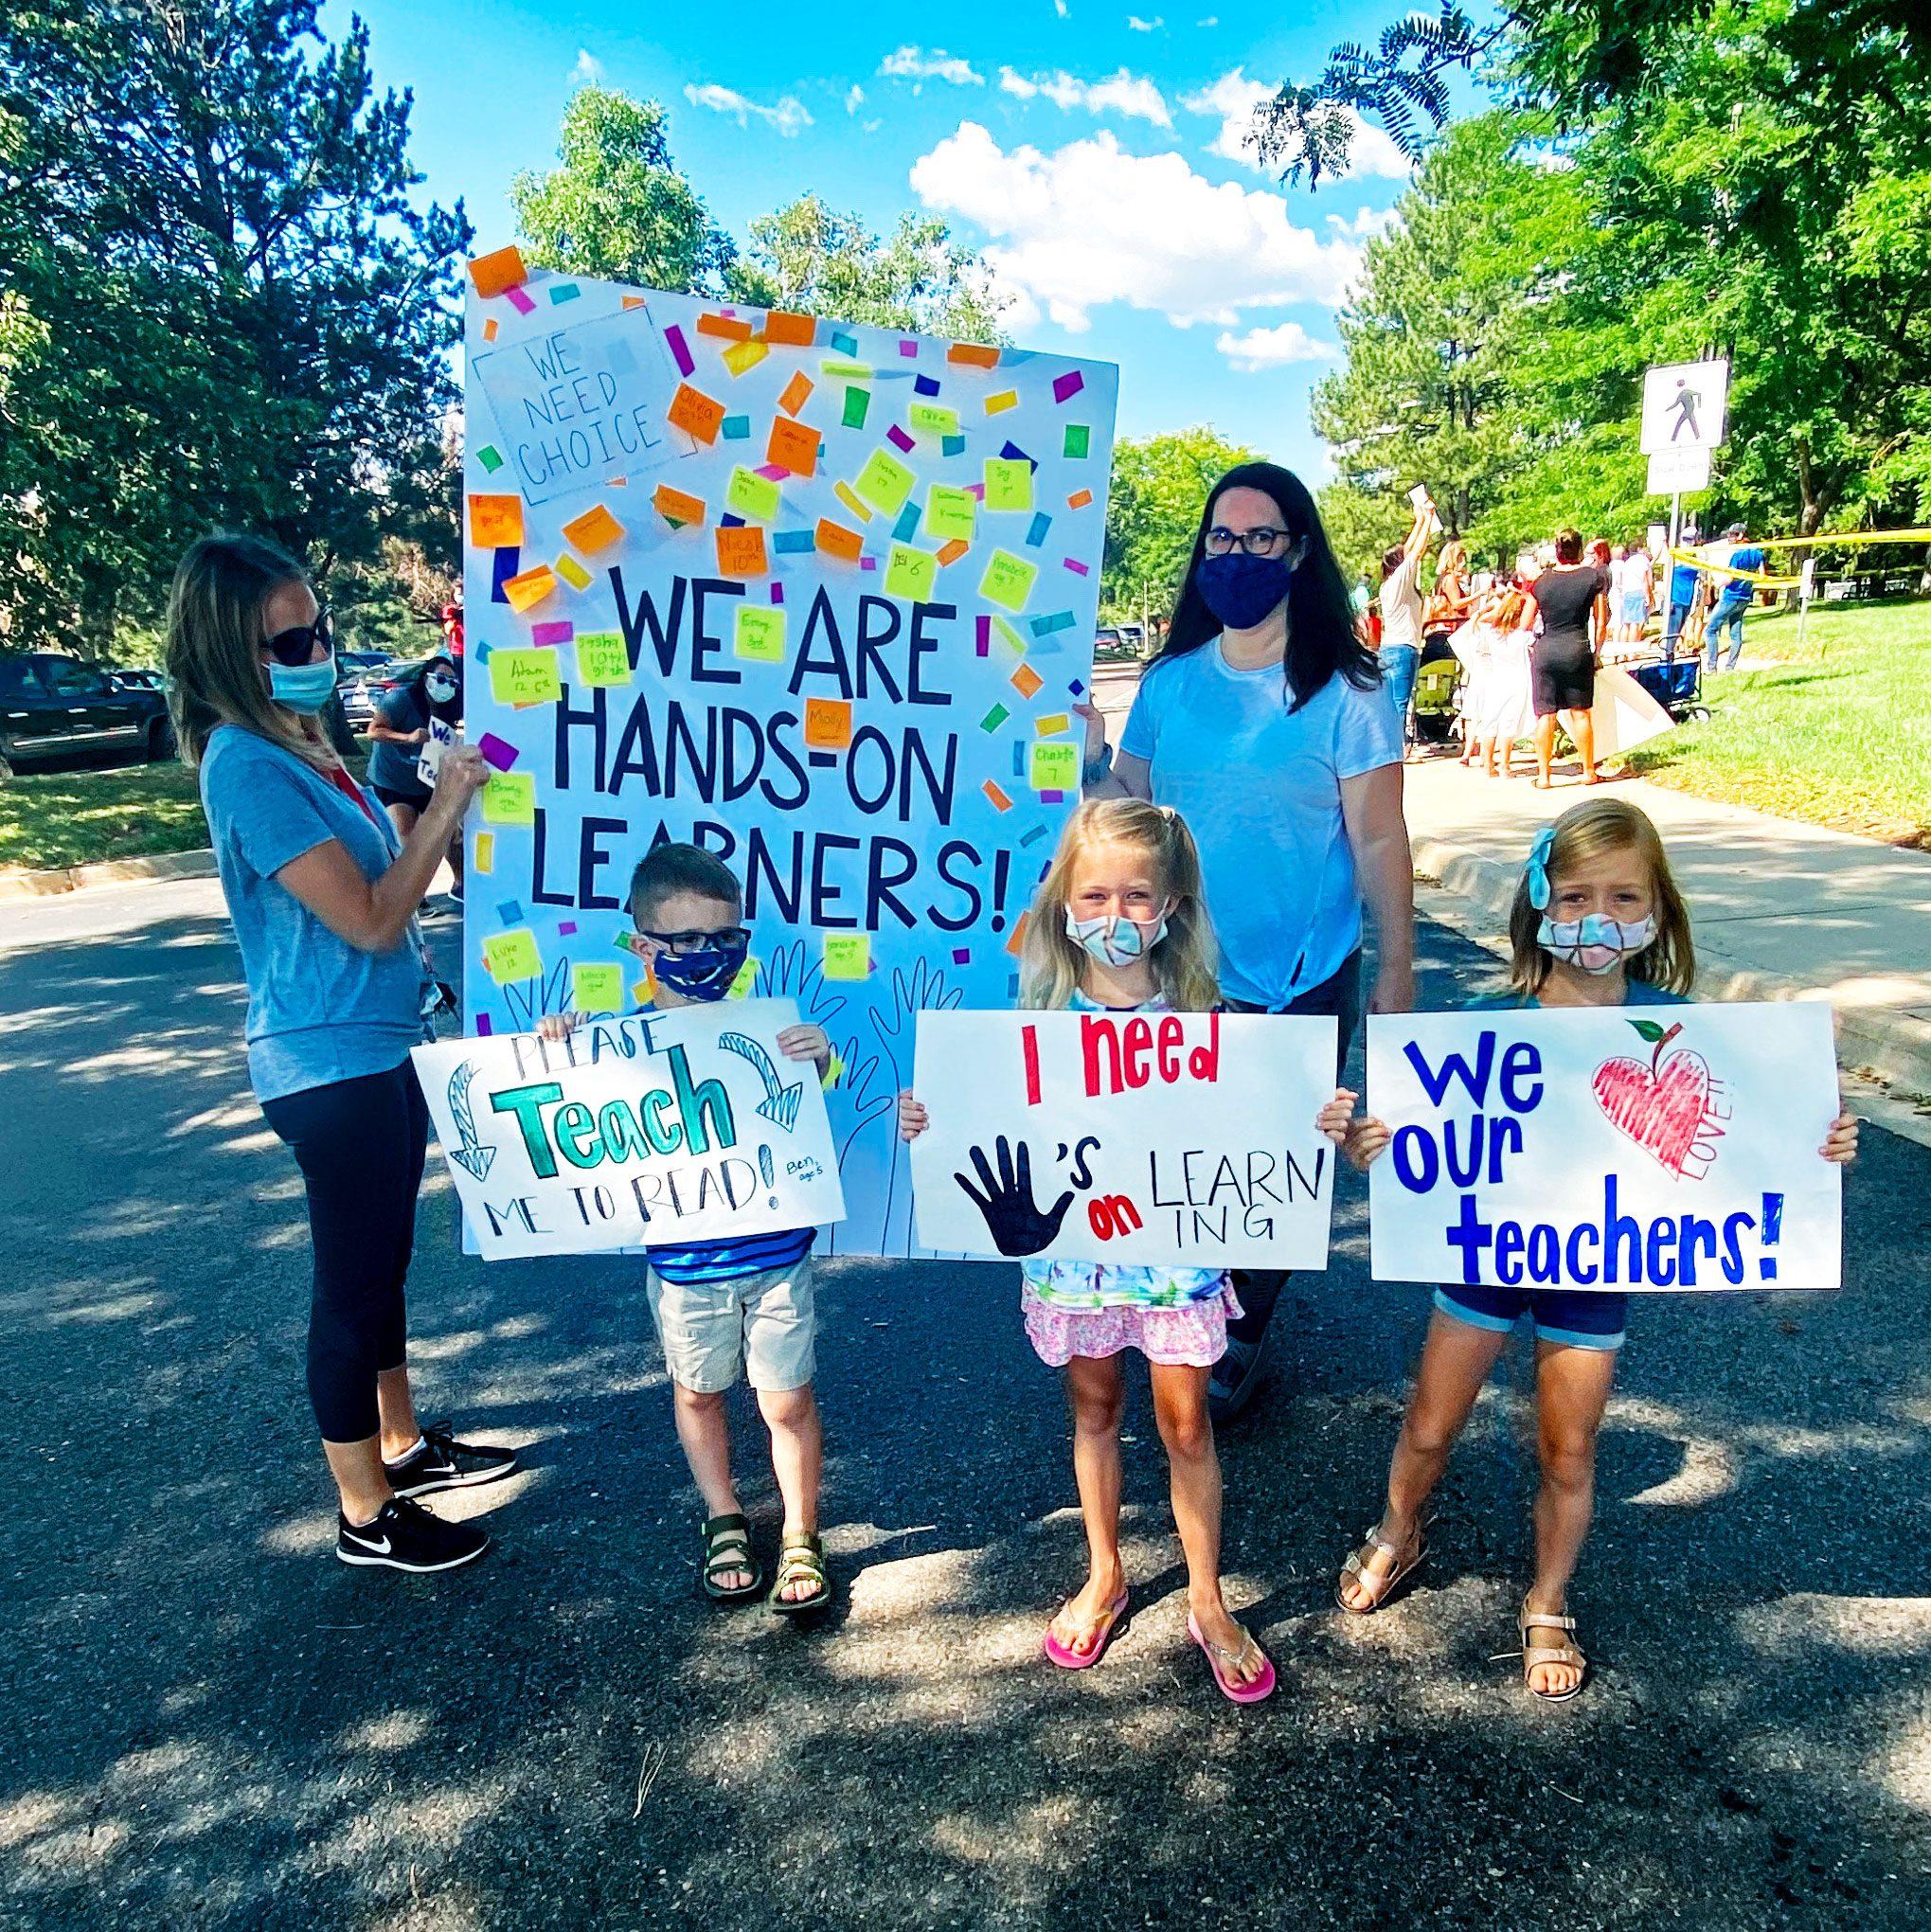 protesting closed schools